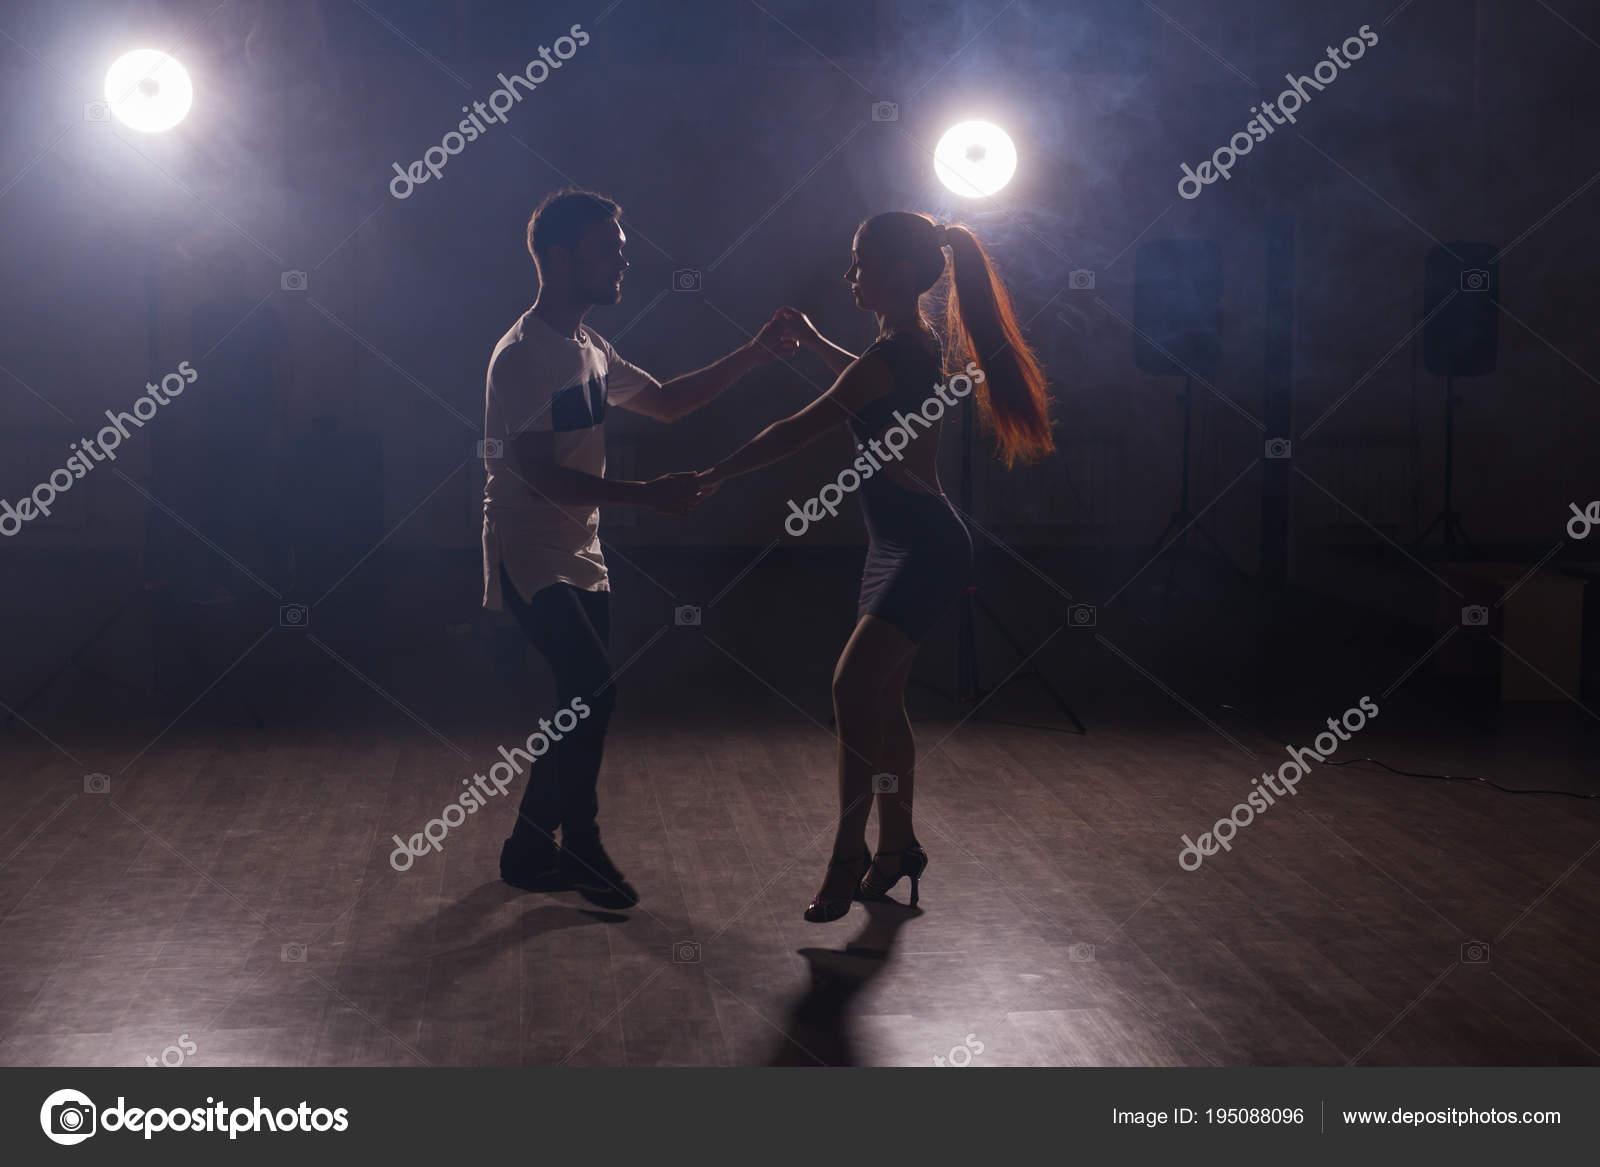 Молодая пара танцев латинской музыки. Бачата, меренге, сальса.